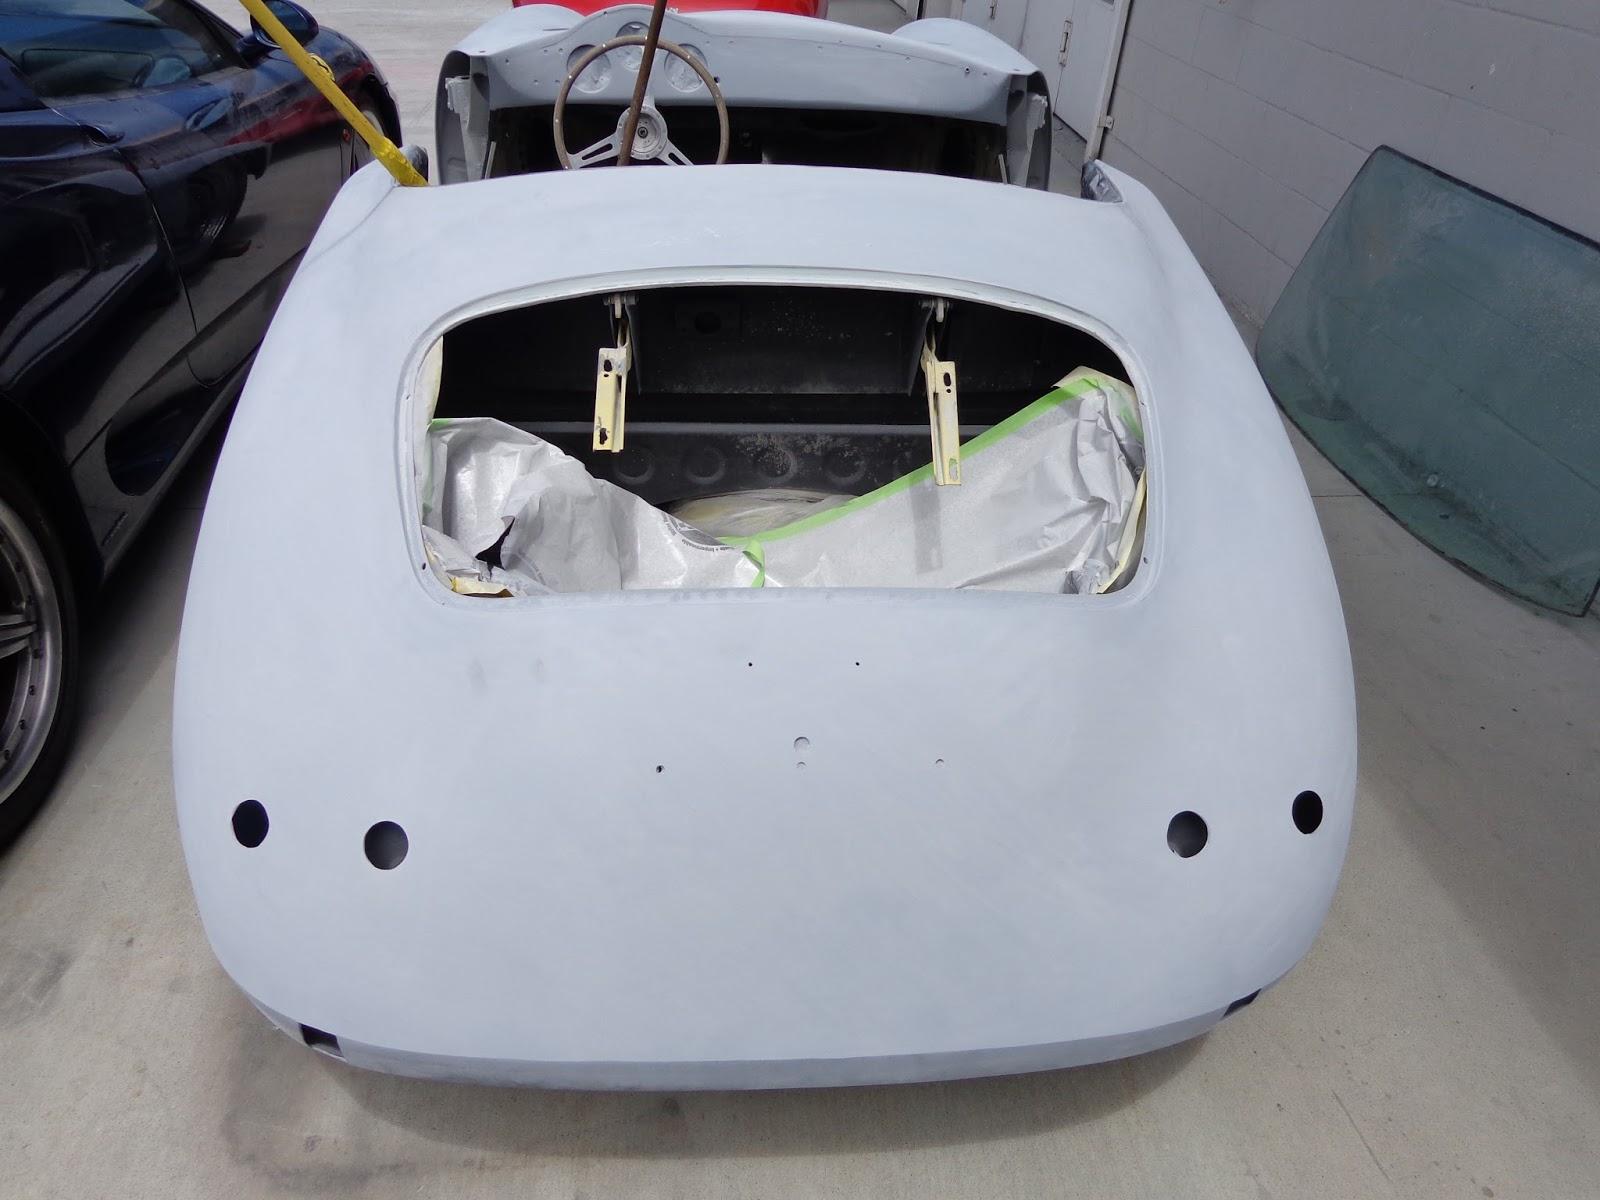 Personalized Autohaus Wayne Baker Racing